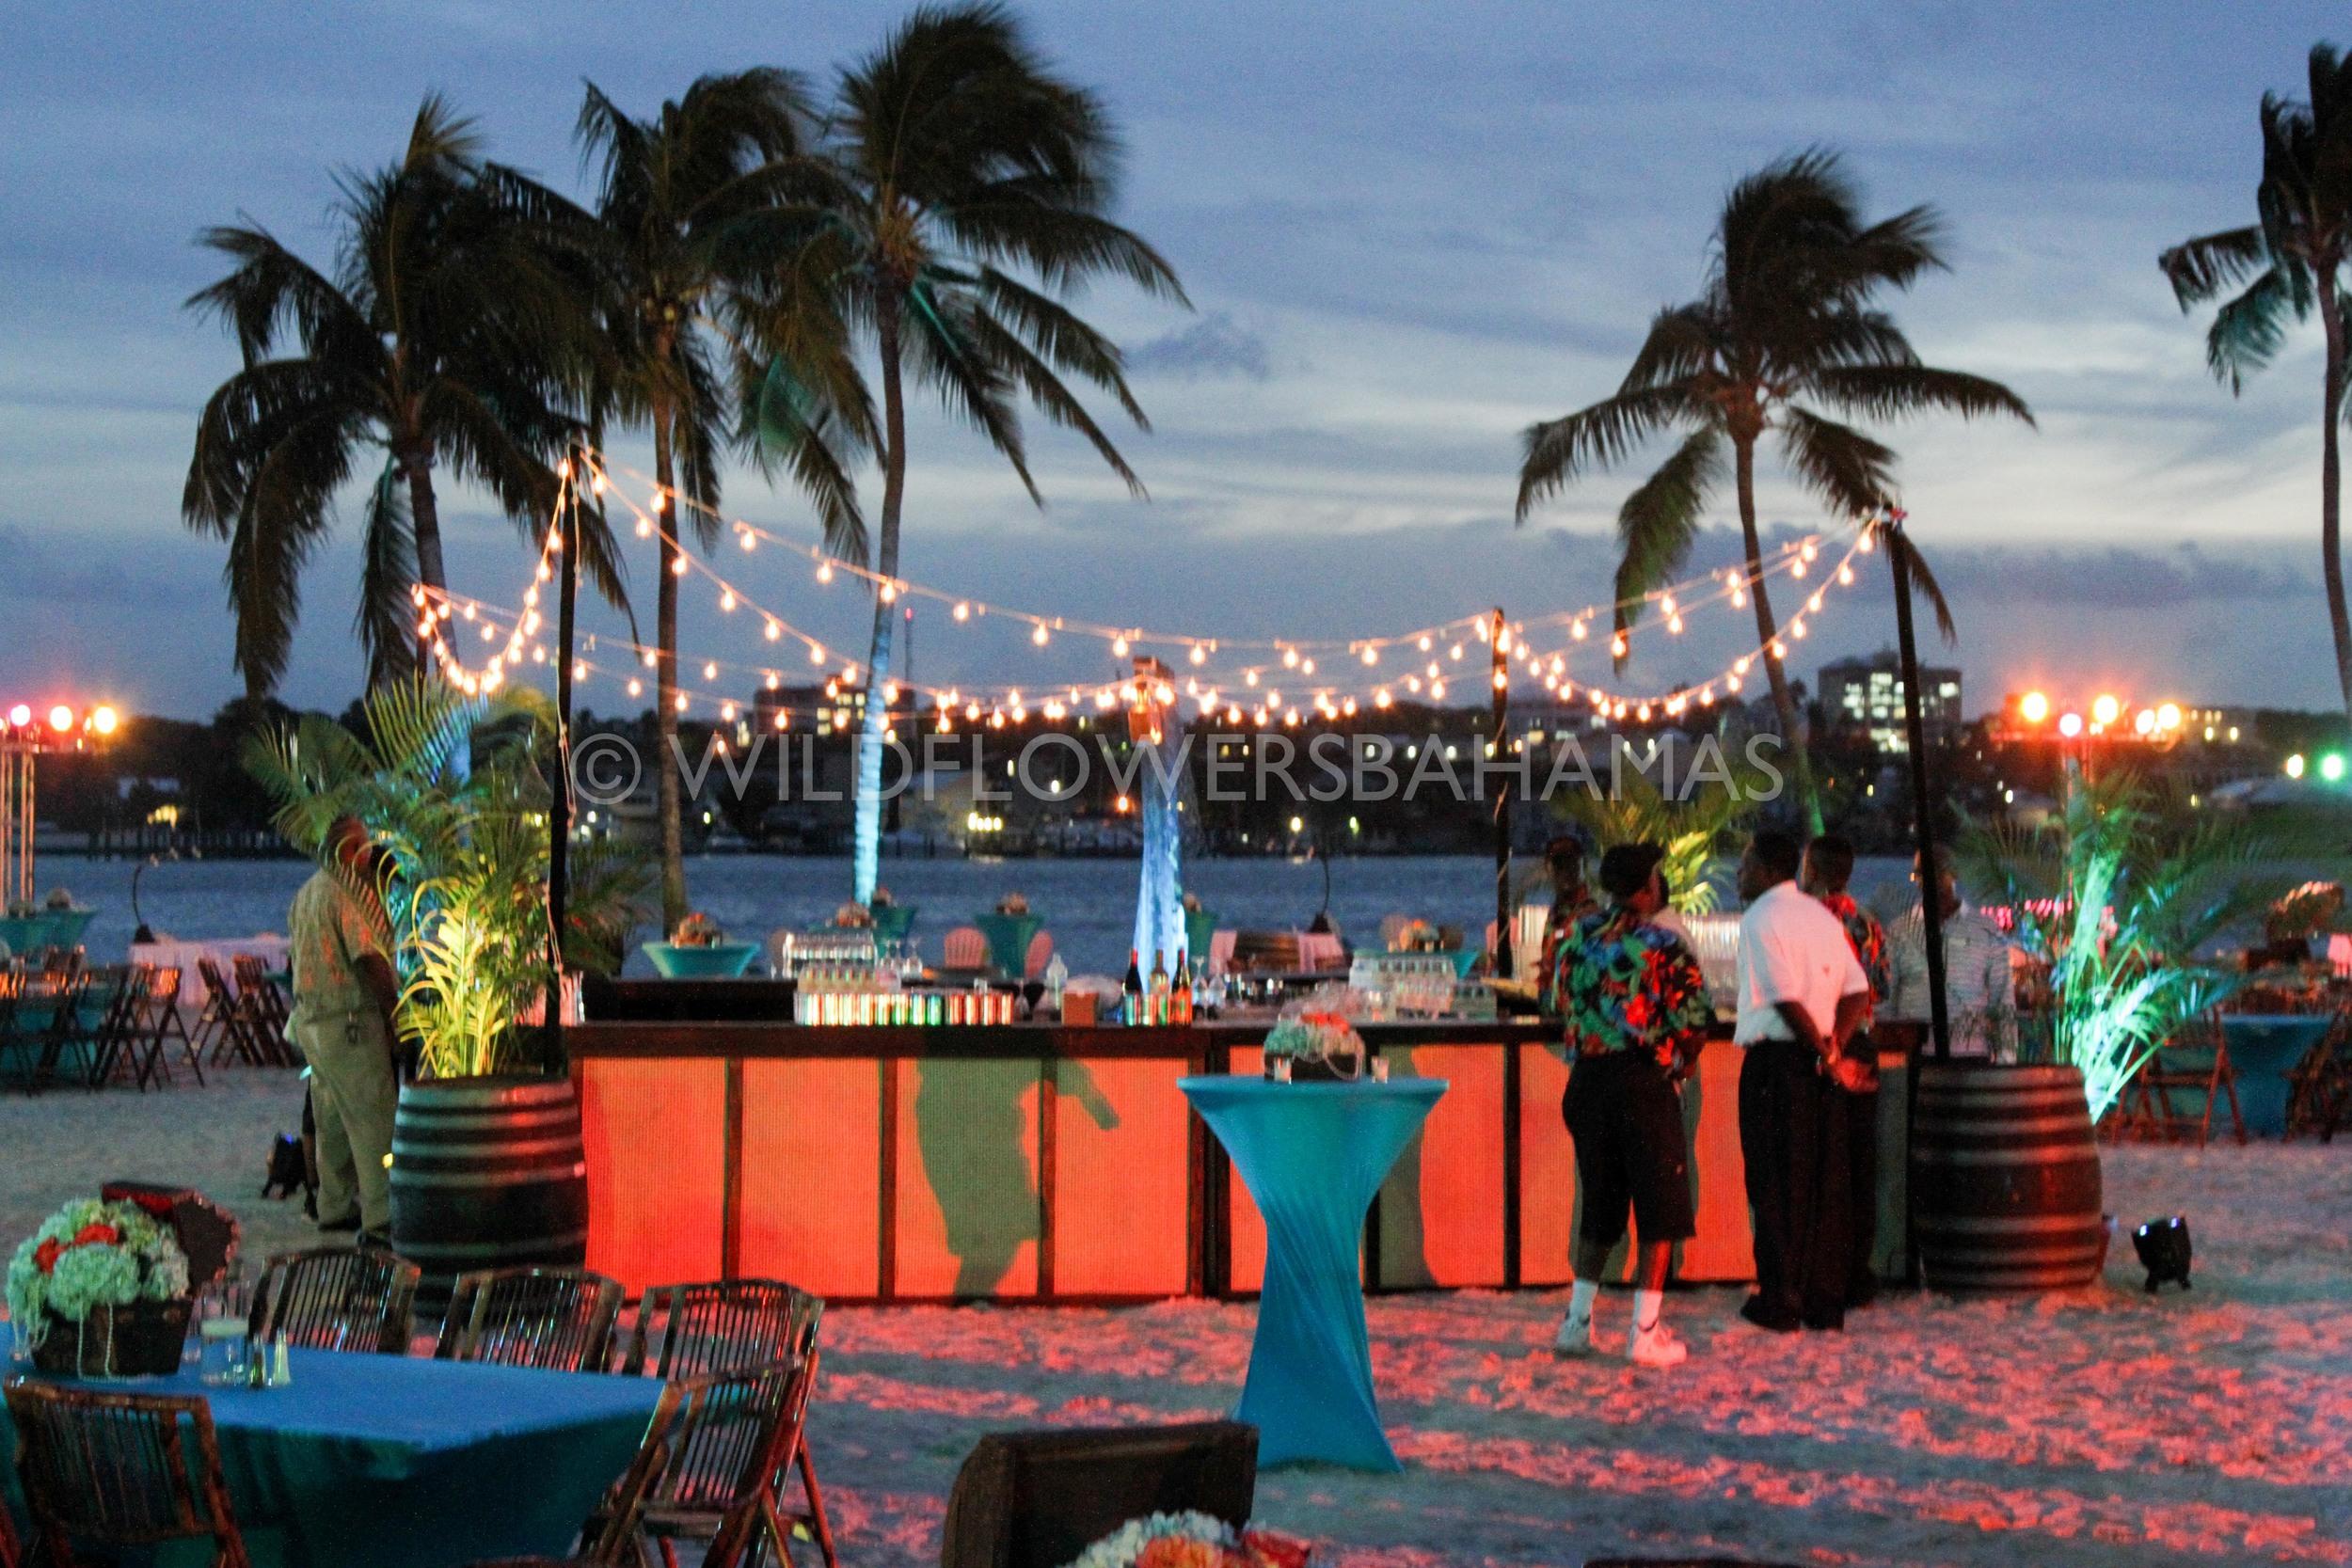 Wildflowers-Bahamas-Weddings-Events-Decor-Floral-3.jpg